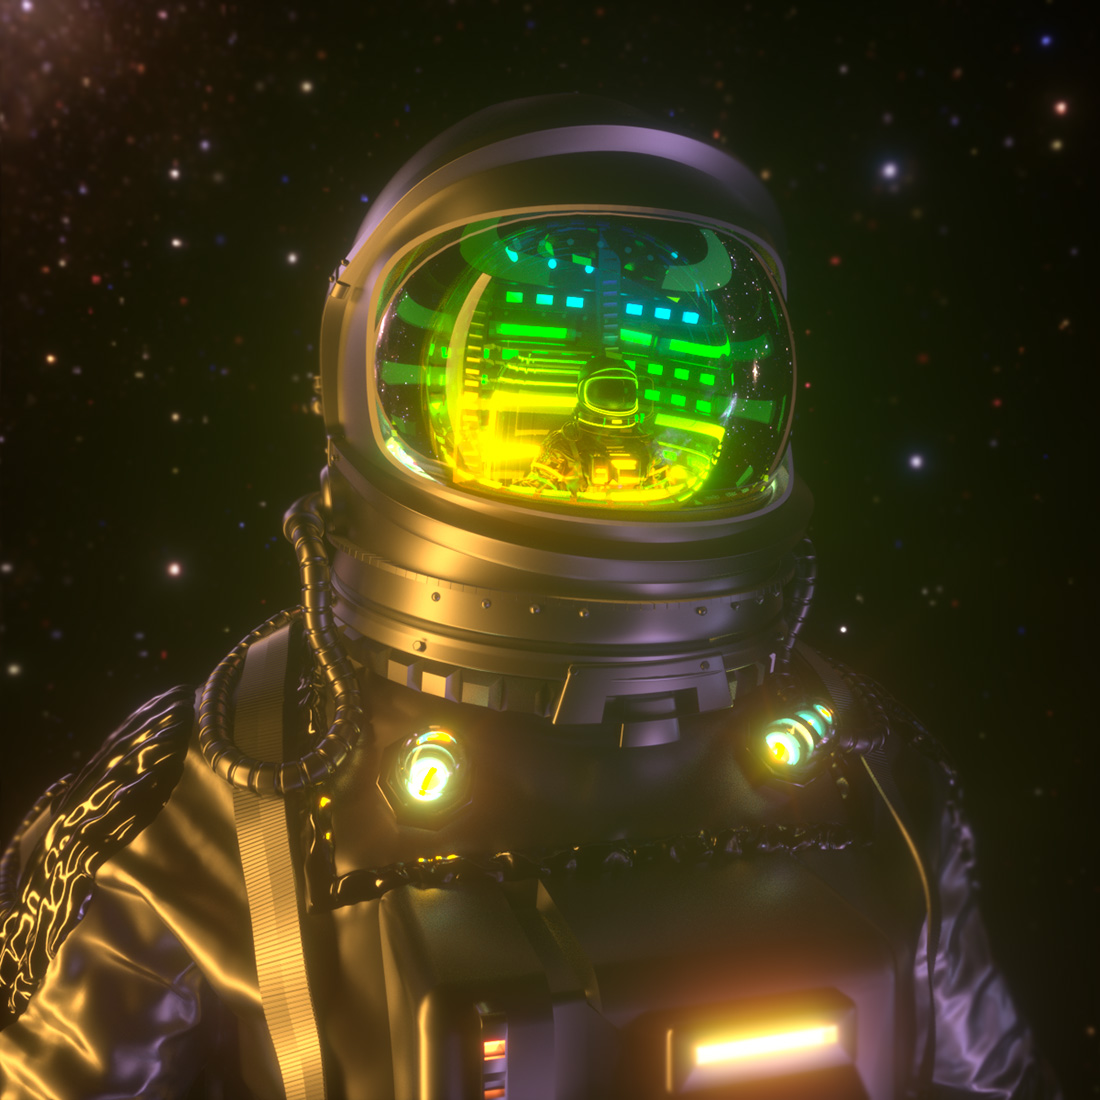 Astrohead_01_01_0090_0090